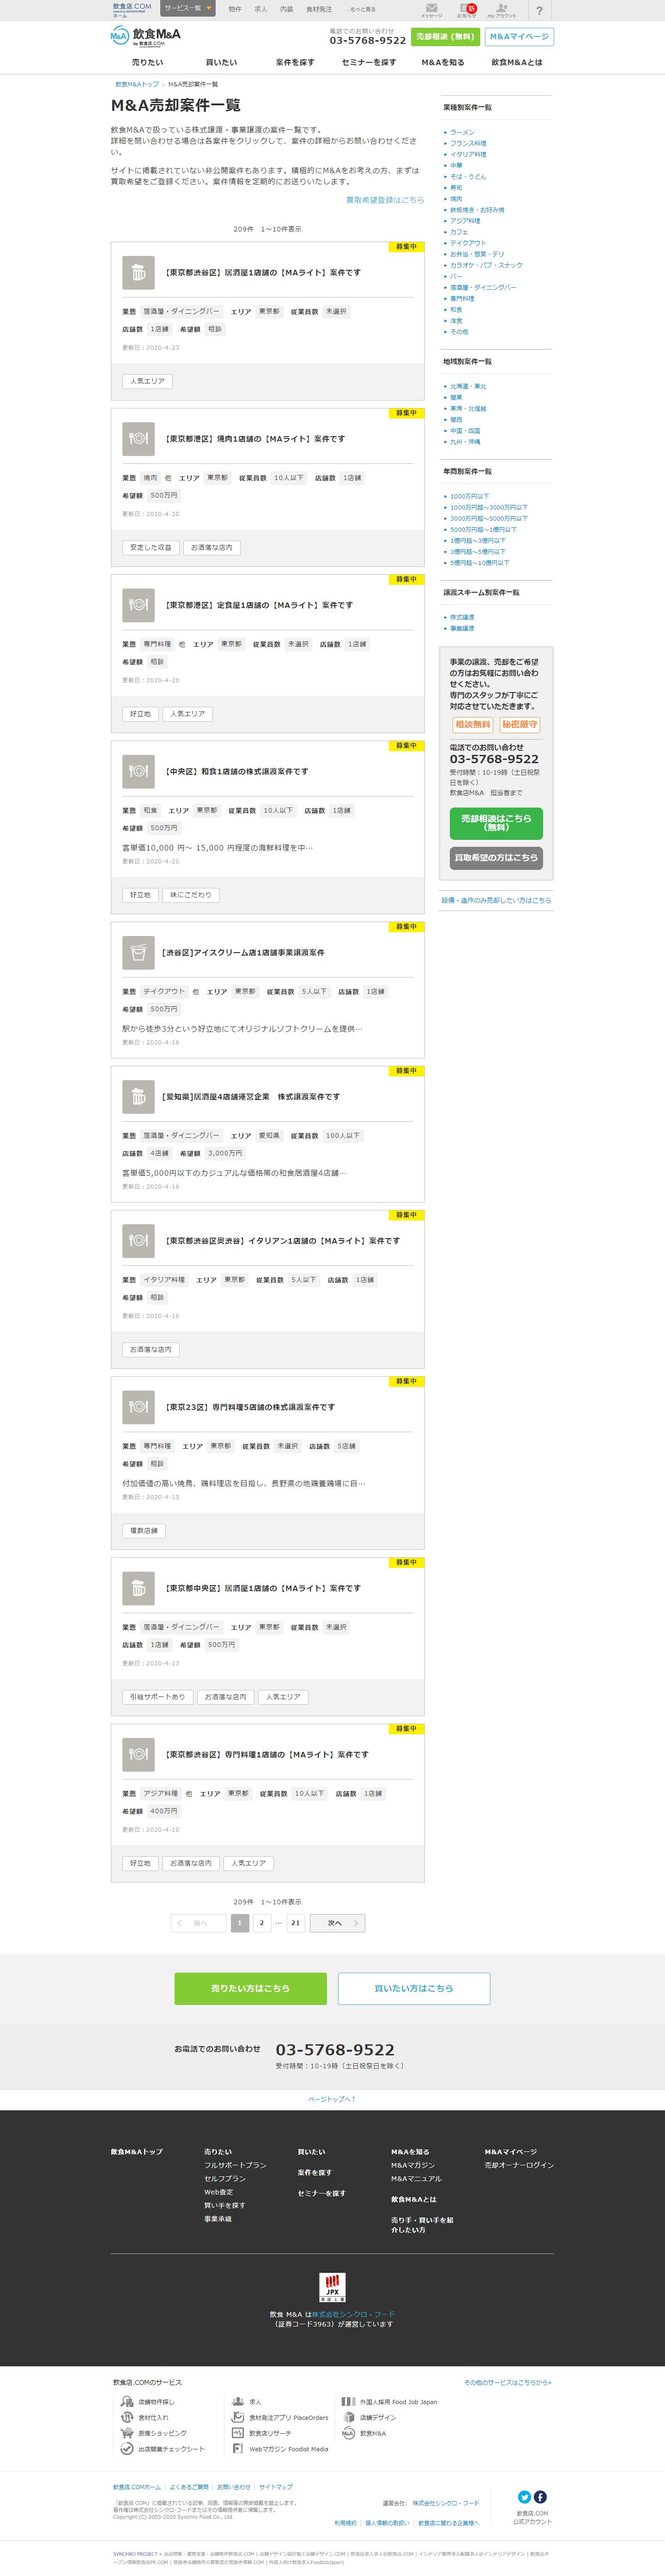 screencapture-inshokuten-ma-sale-cases-2020-04-26-12_45_26.png